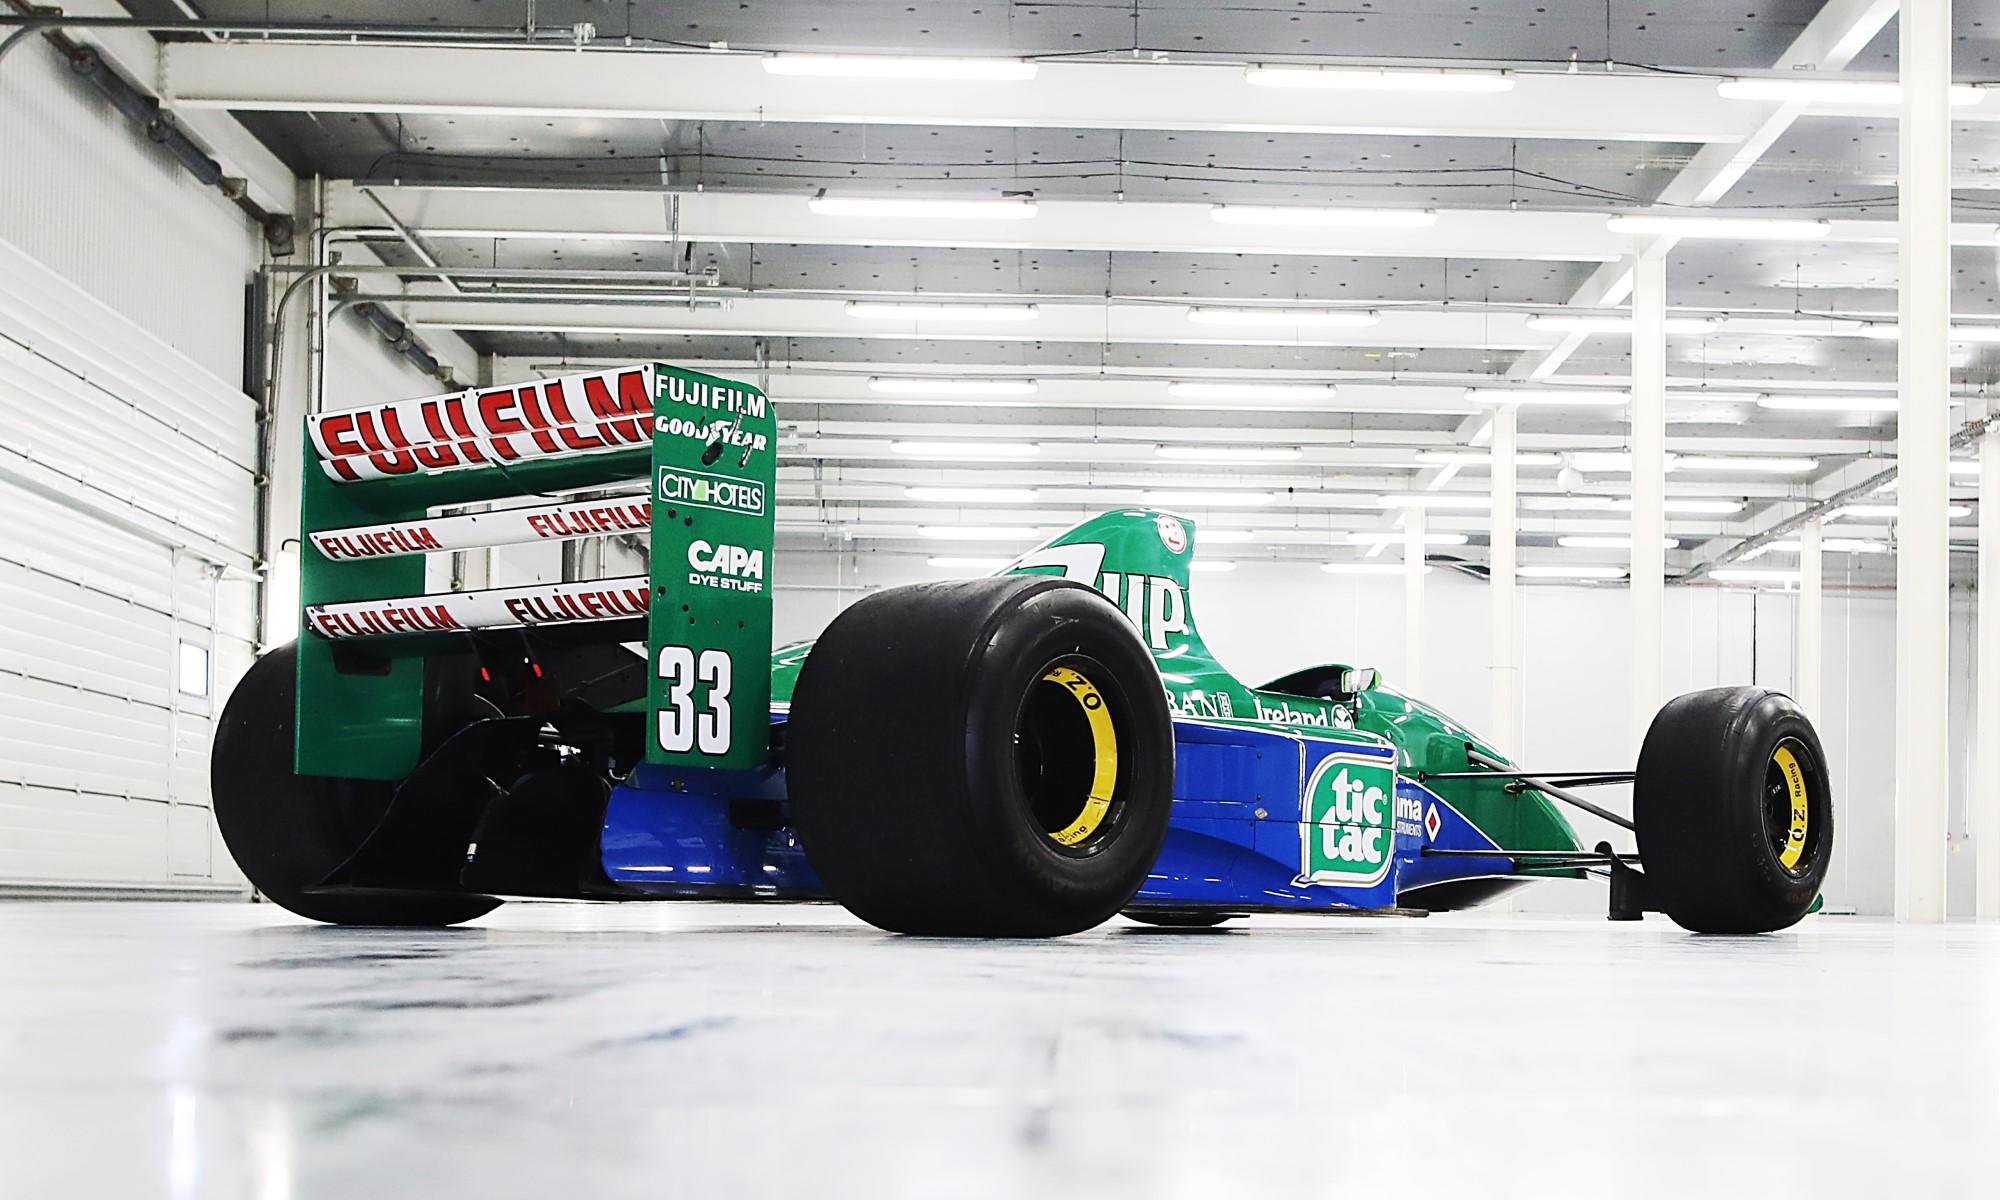 Schumacher Jordan F1 car rear